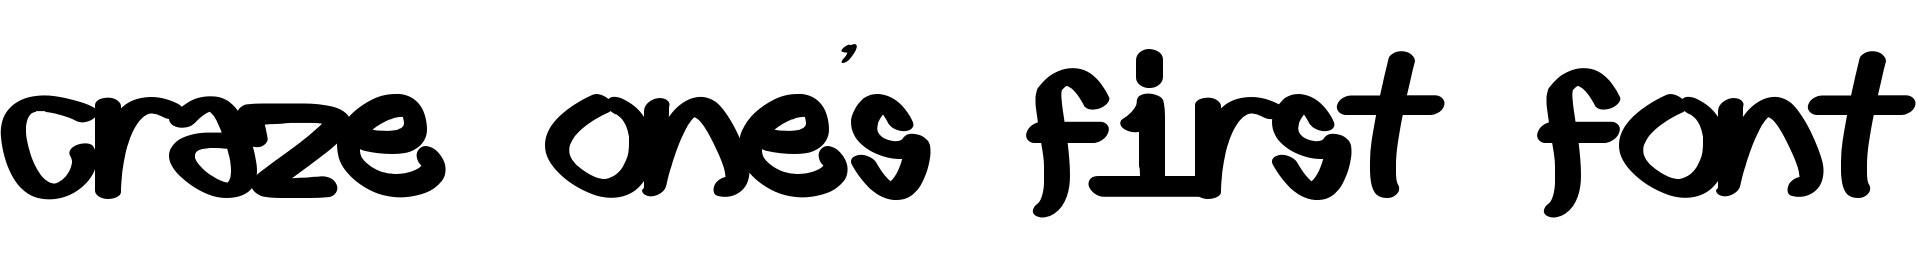 Craze One's first font